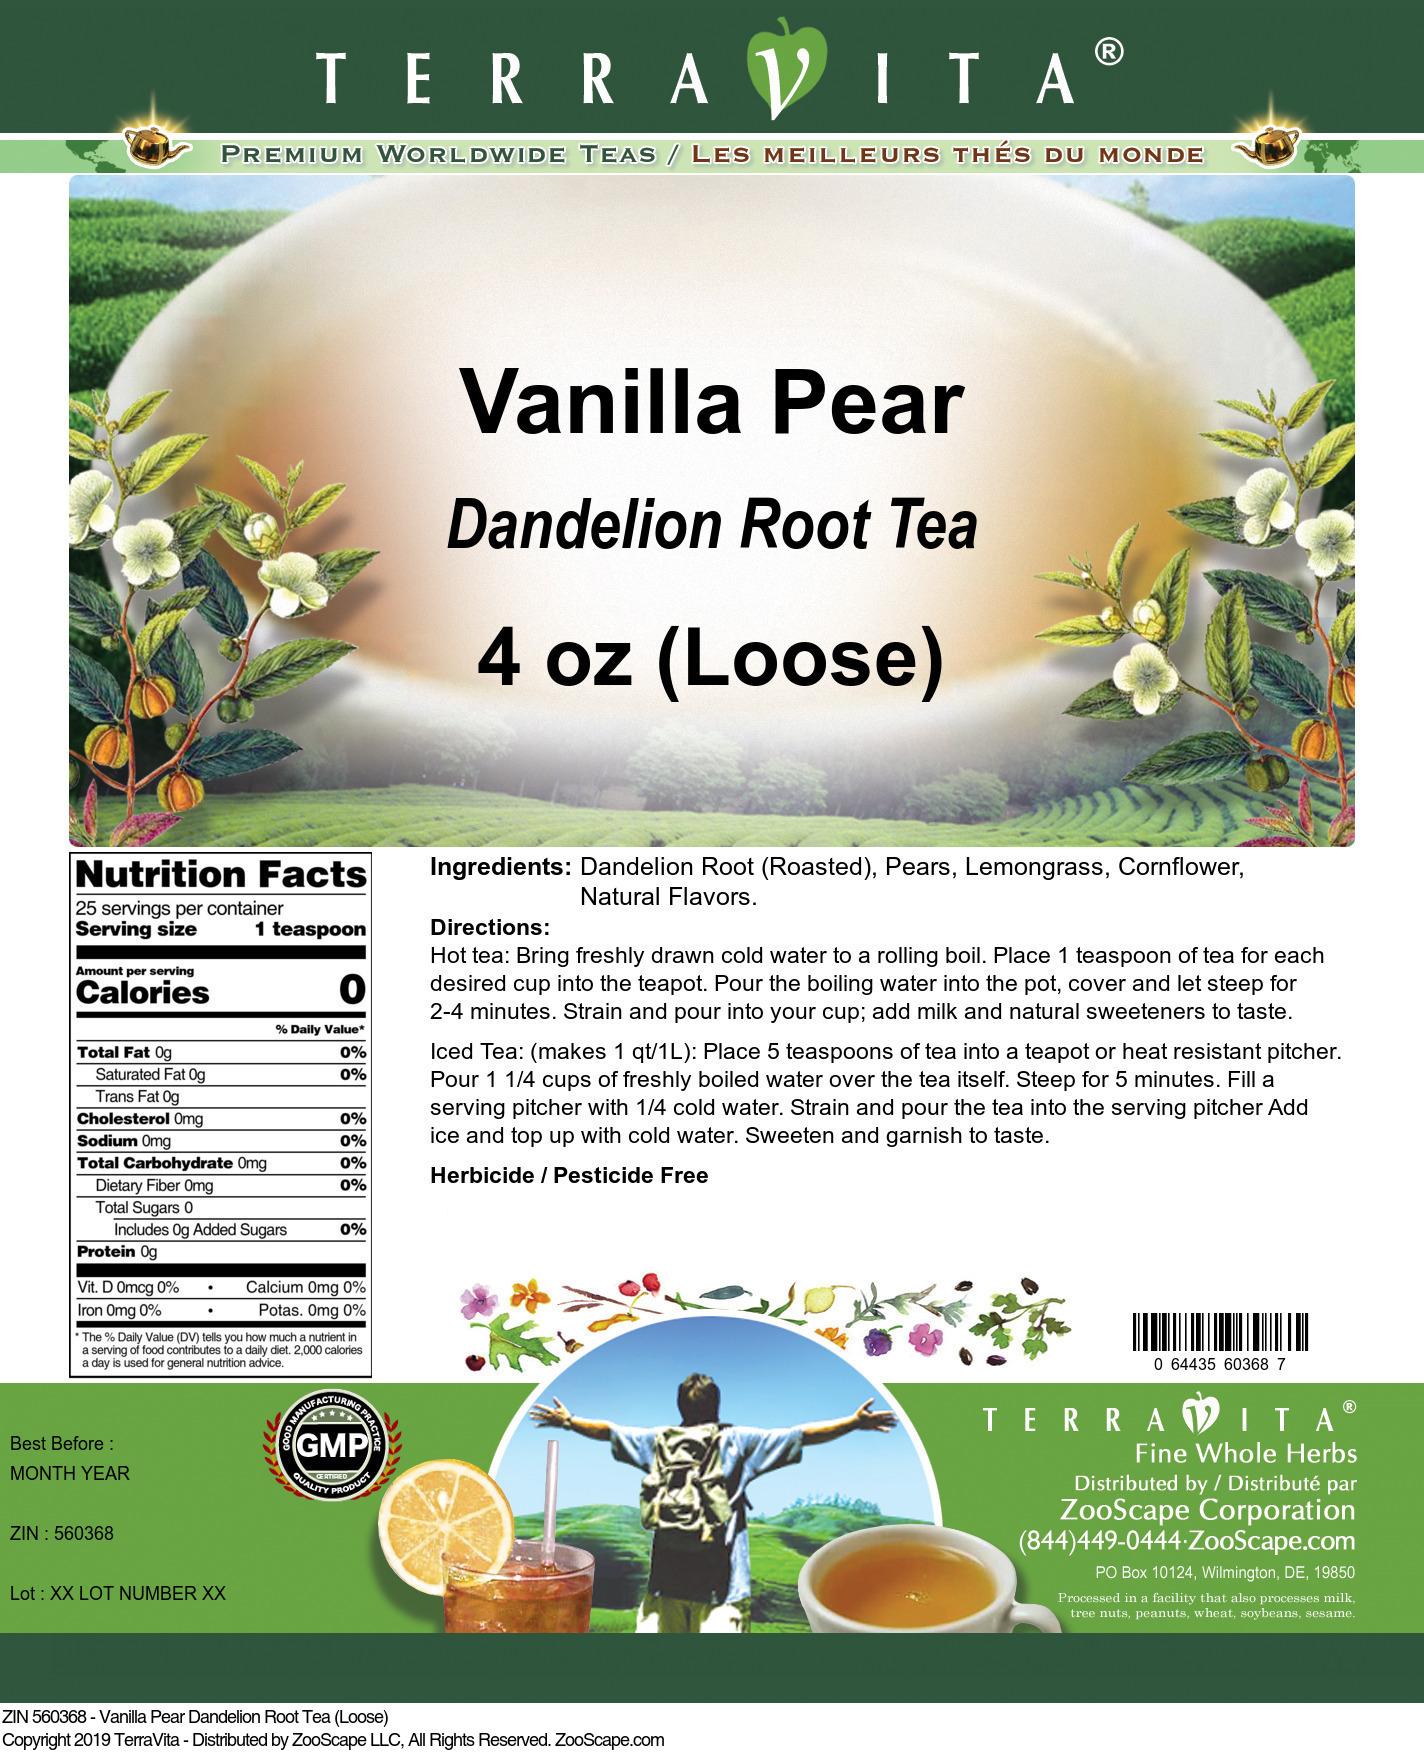 Vanilla Pear Dandelion Root Tea (Loose)